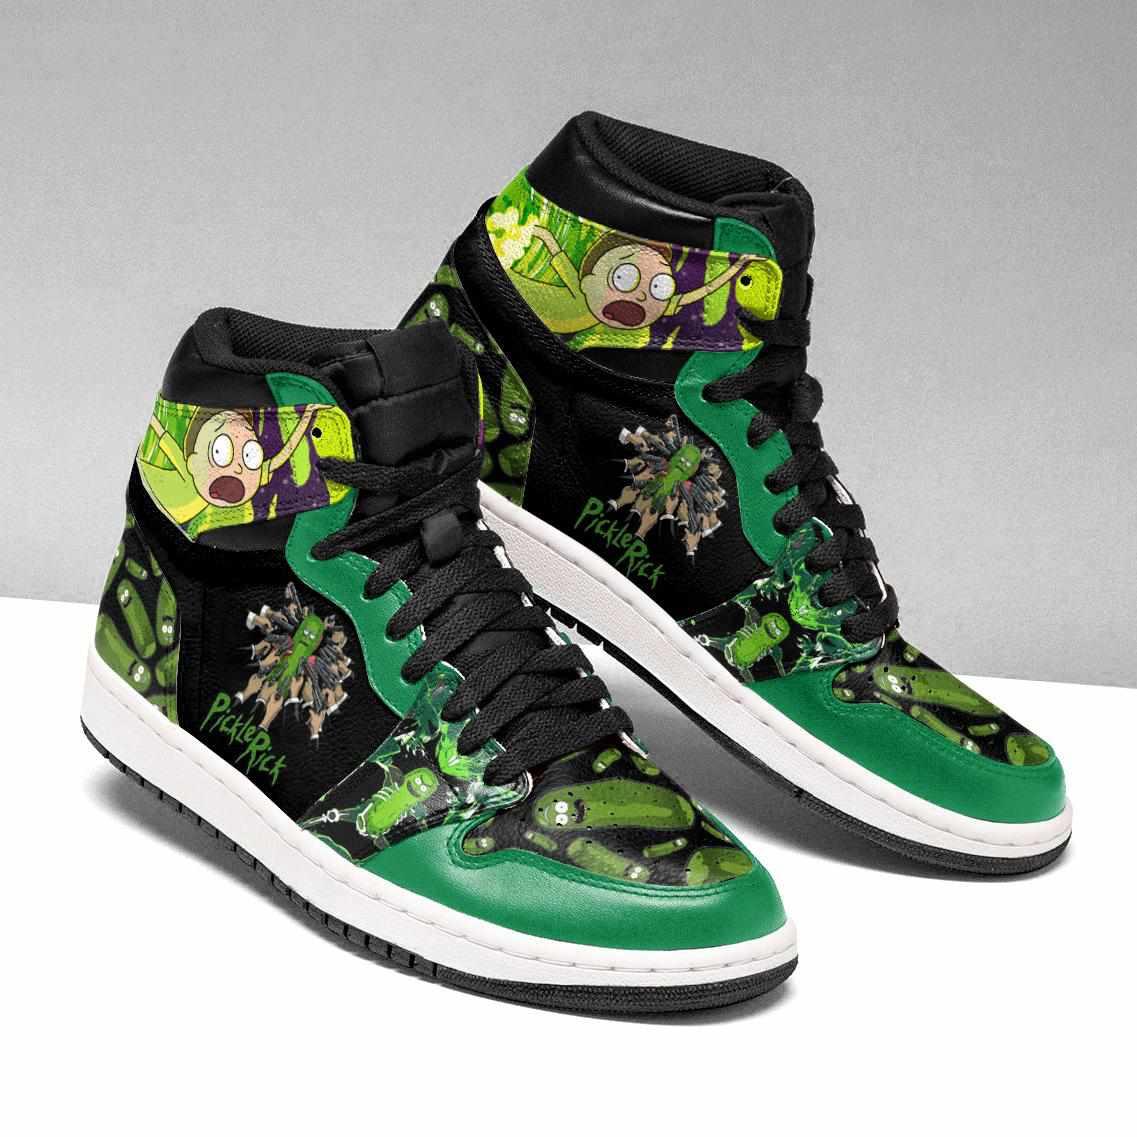 Rick And Morty Ha06 Custom Air Jordan Shoes